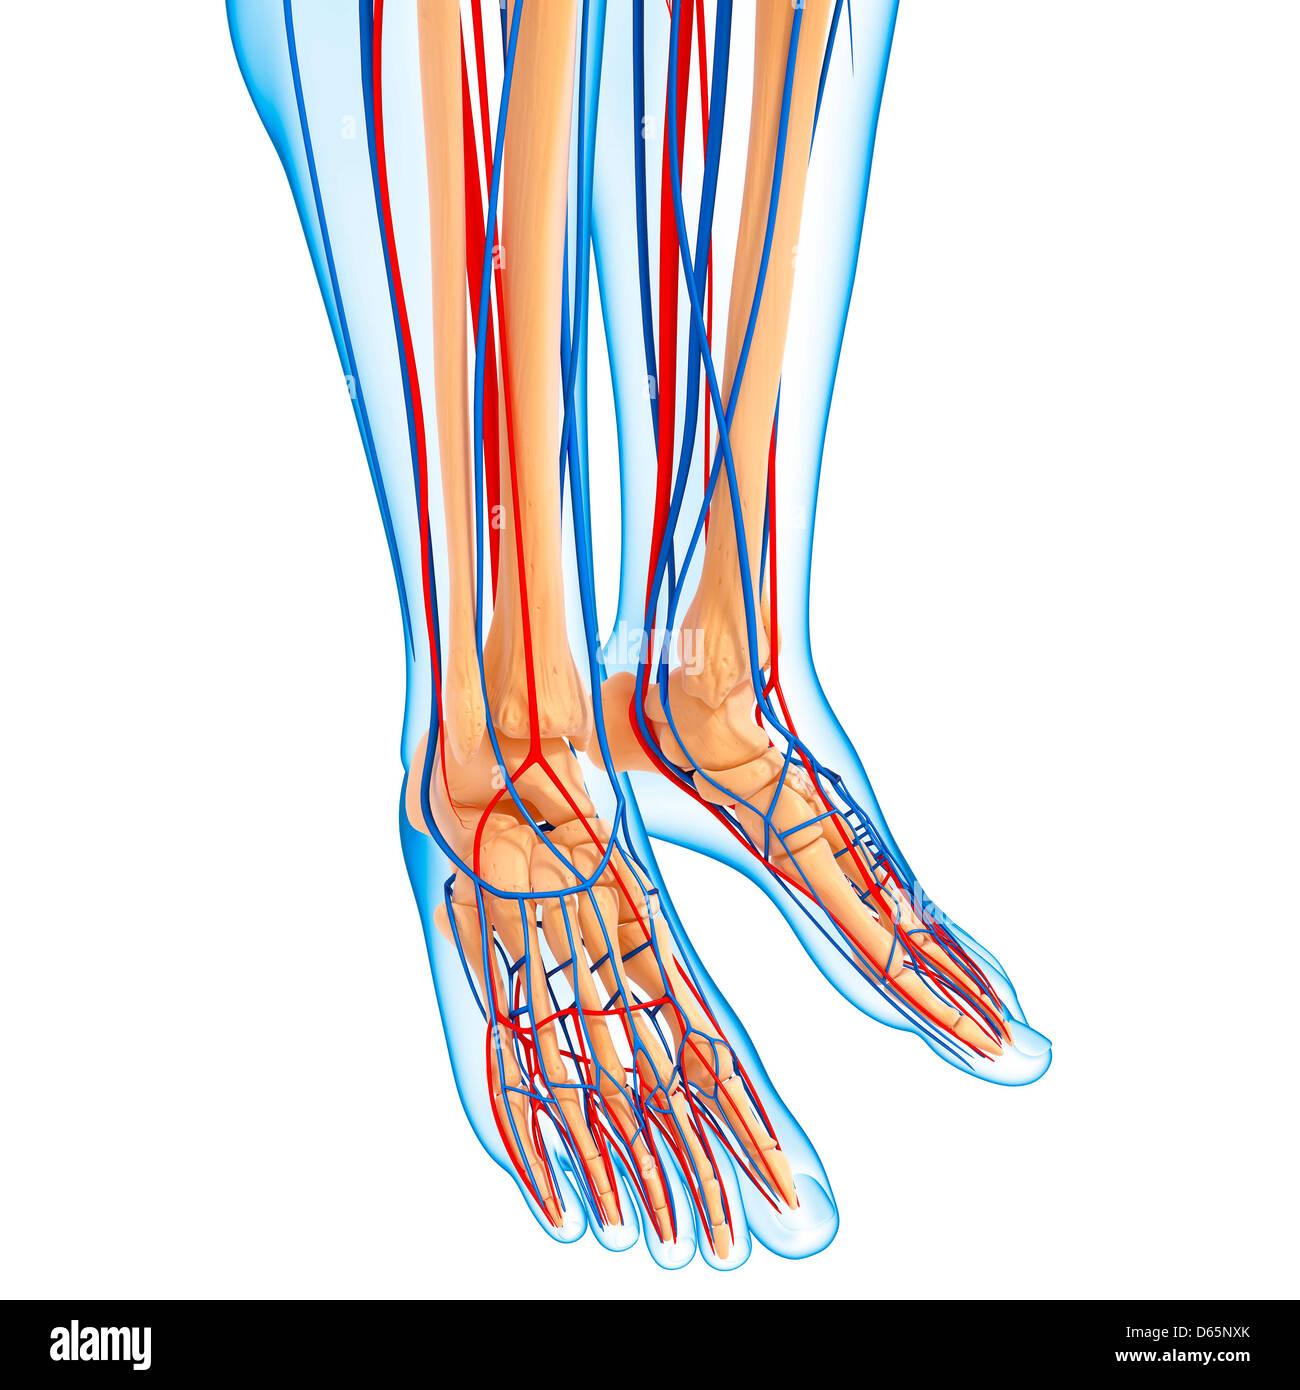 Lower Leg Anatomy Stock Photos & Lower Leg Anatomy Stock Images - Alamy